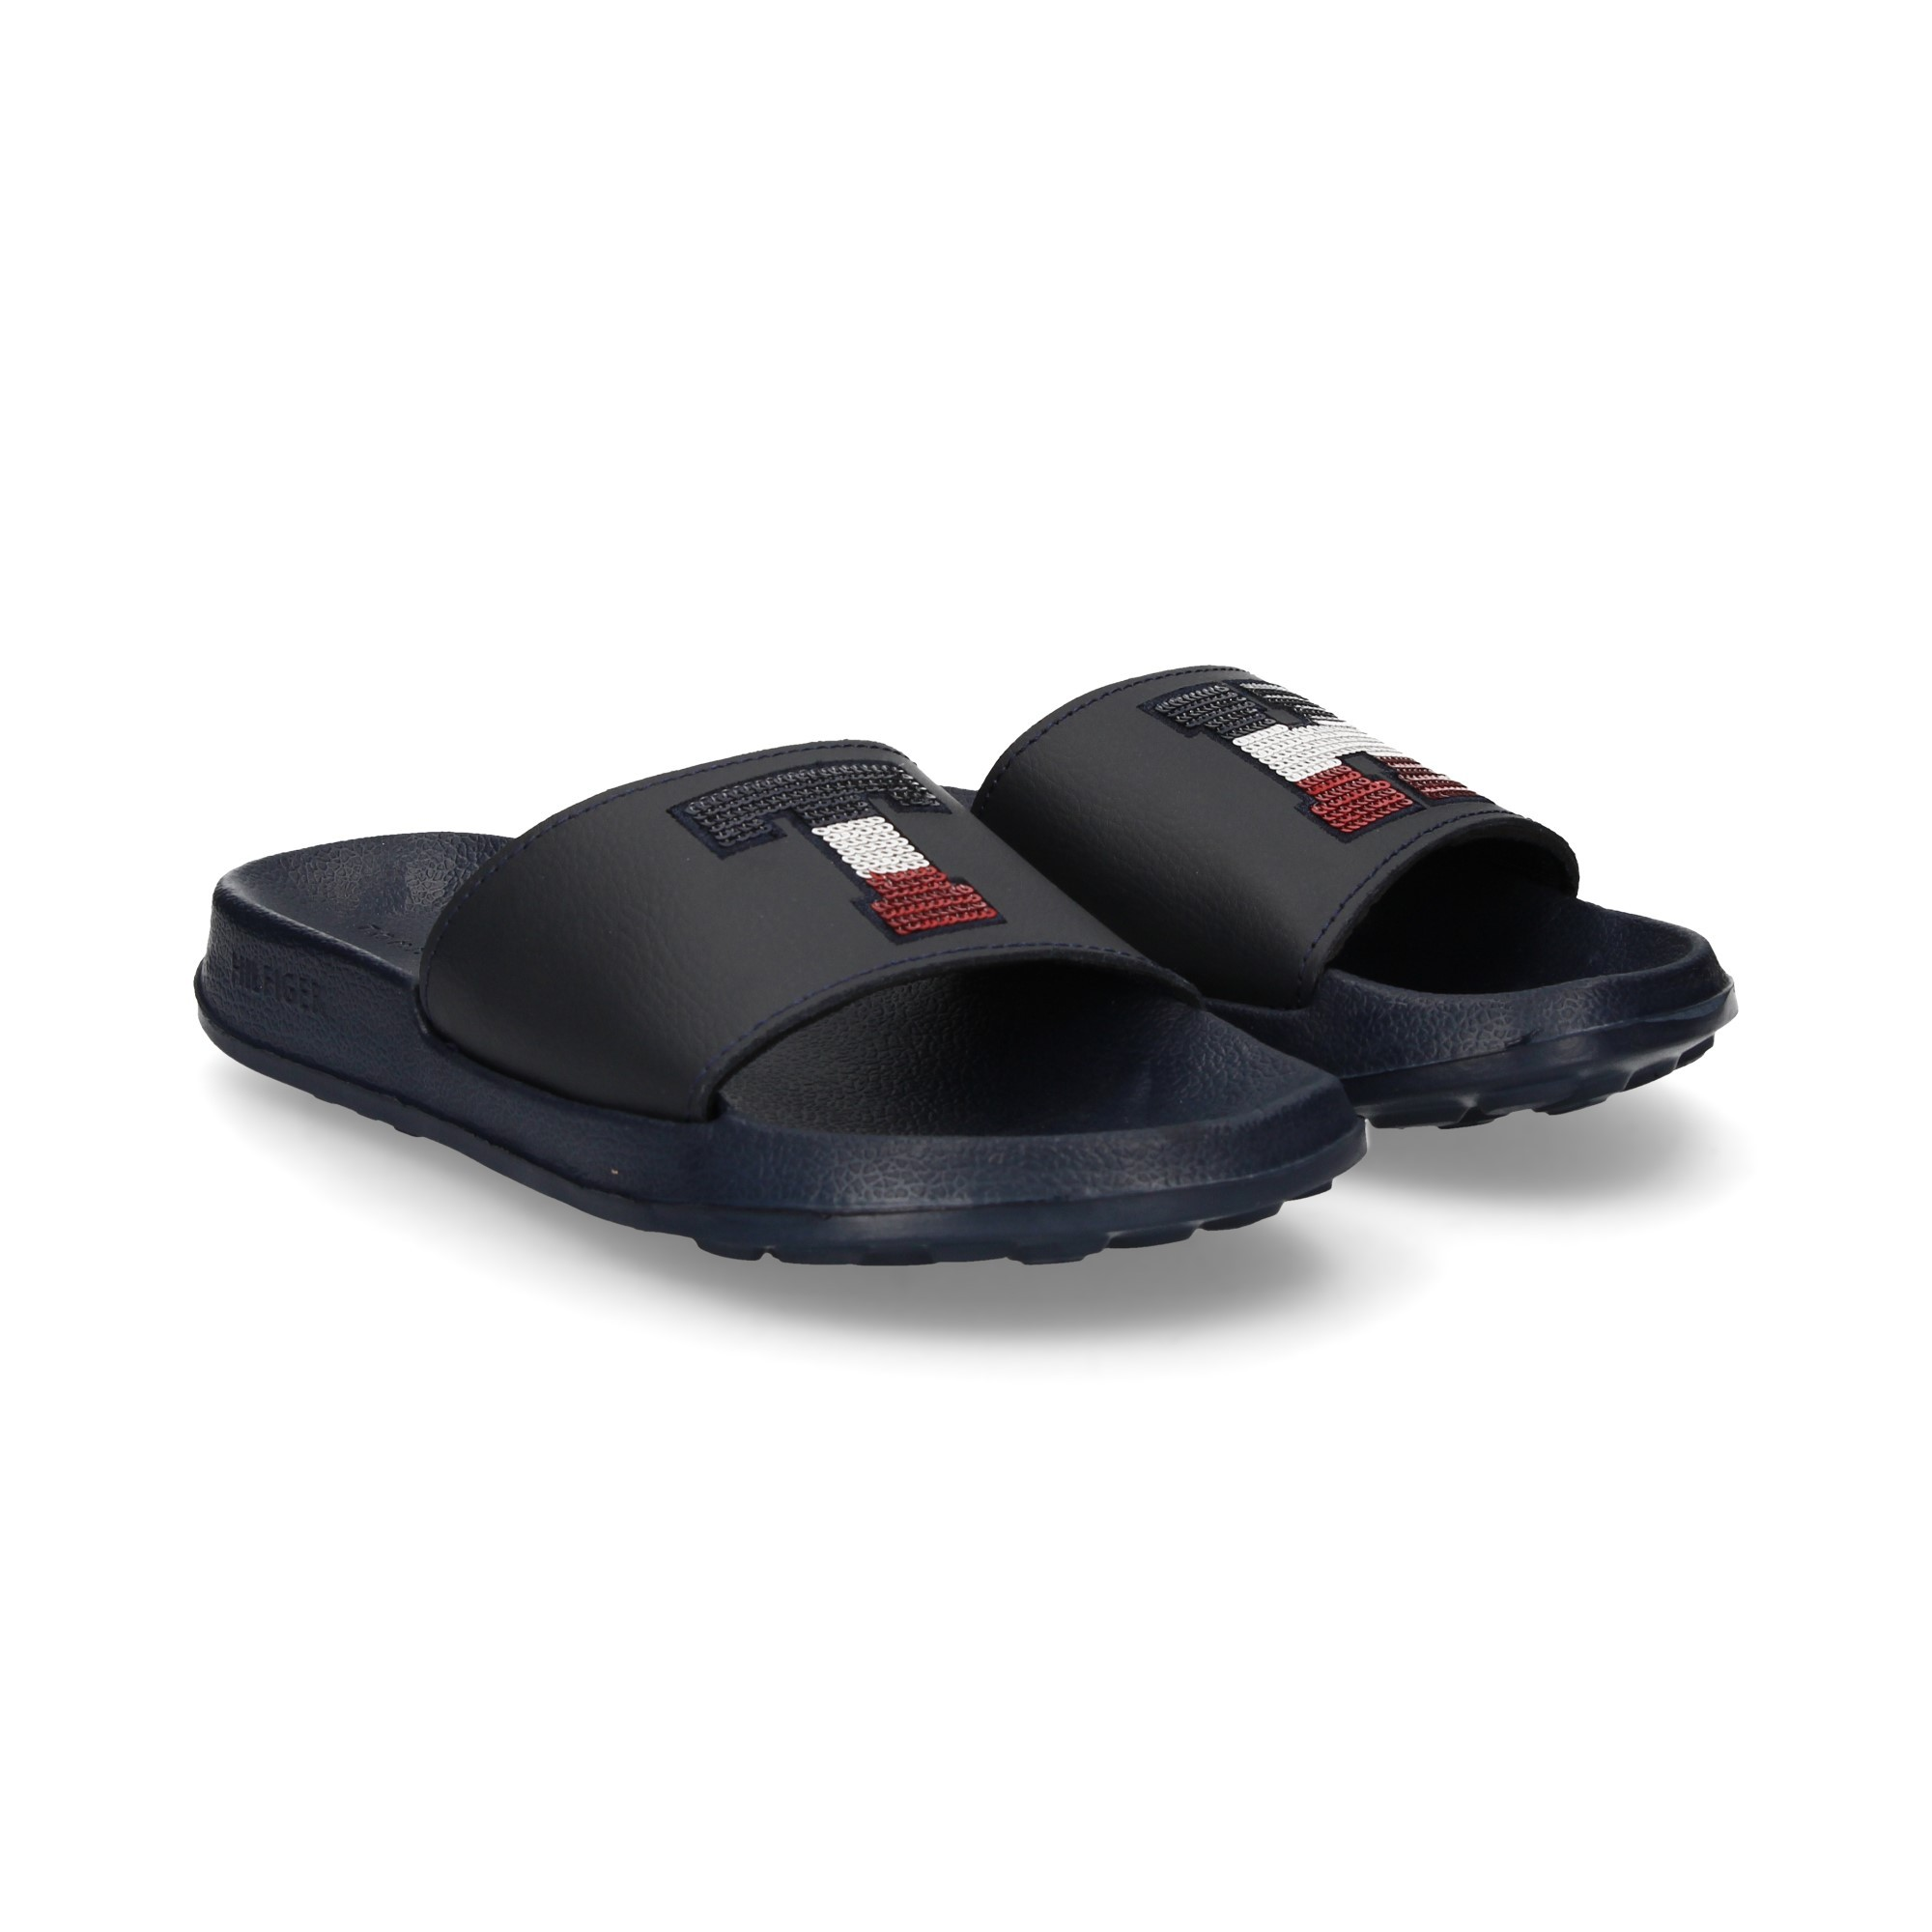 c7813489273e7 TOMMY HILFIGER Women's Flat sandals FW02655 403 MARINO